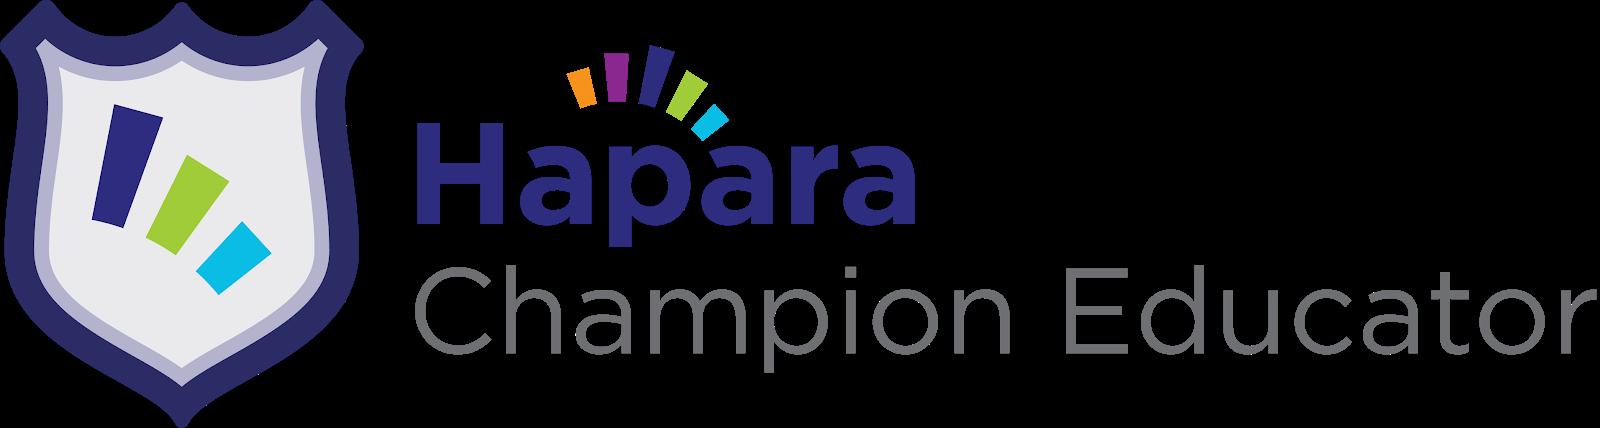 2020 Hapara Champion Educator